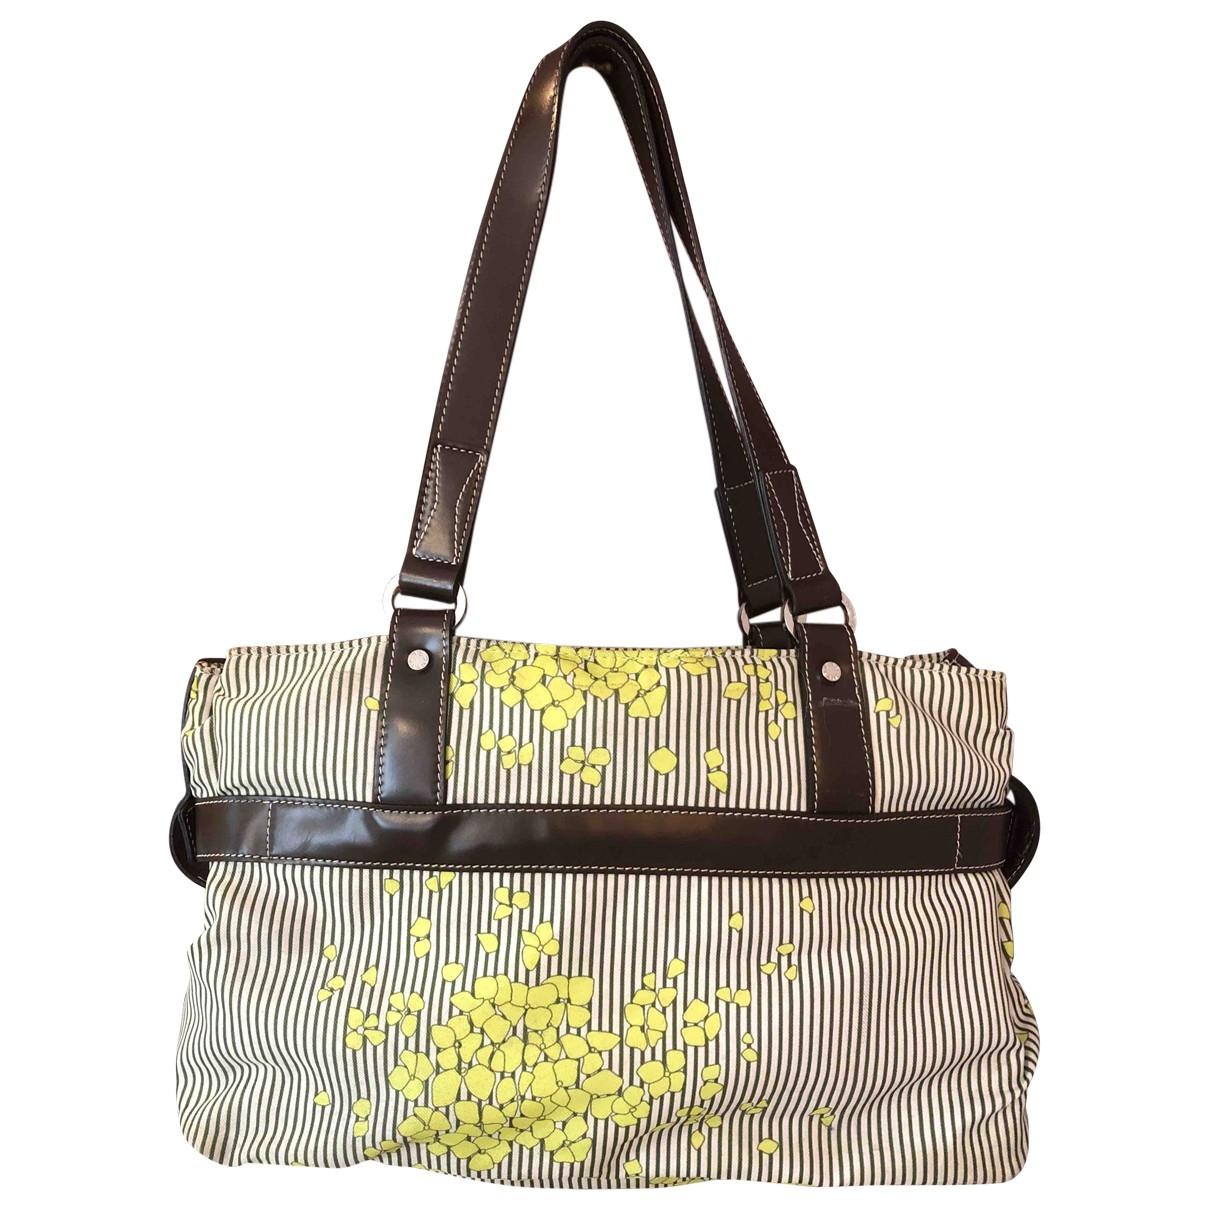 Lancel \N Handtasche in  Bunt Leinen